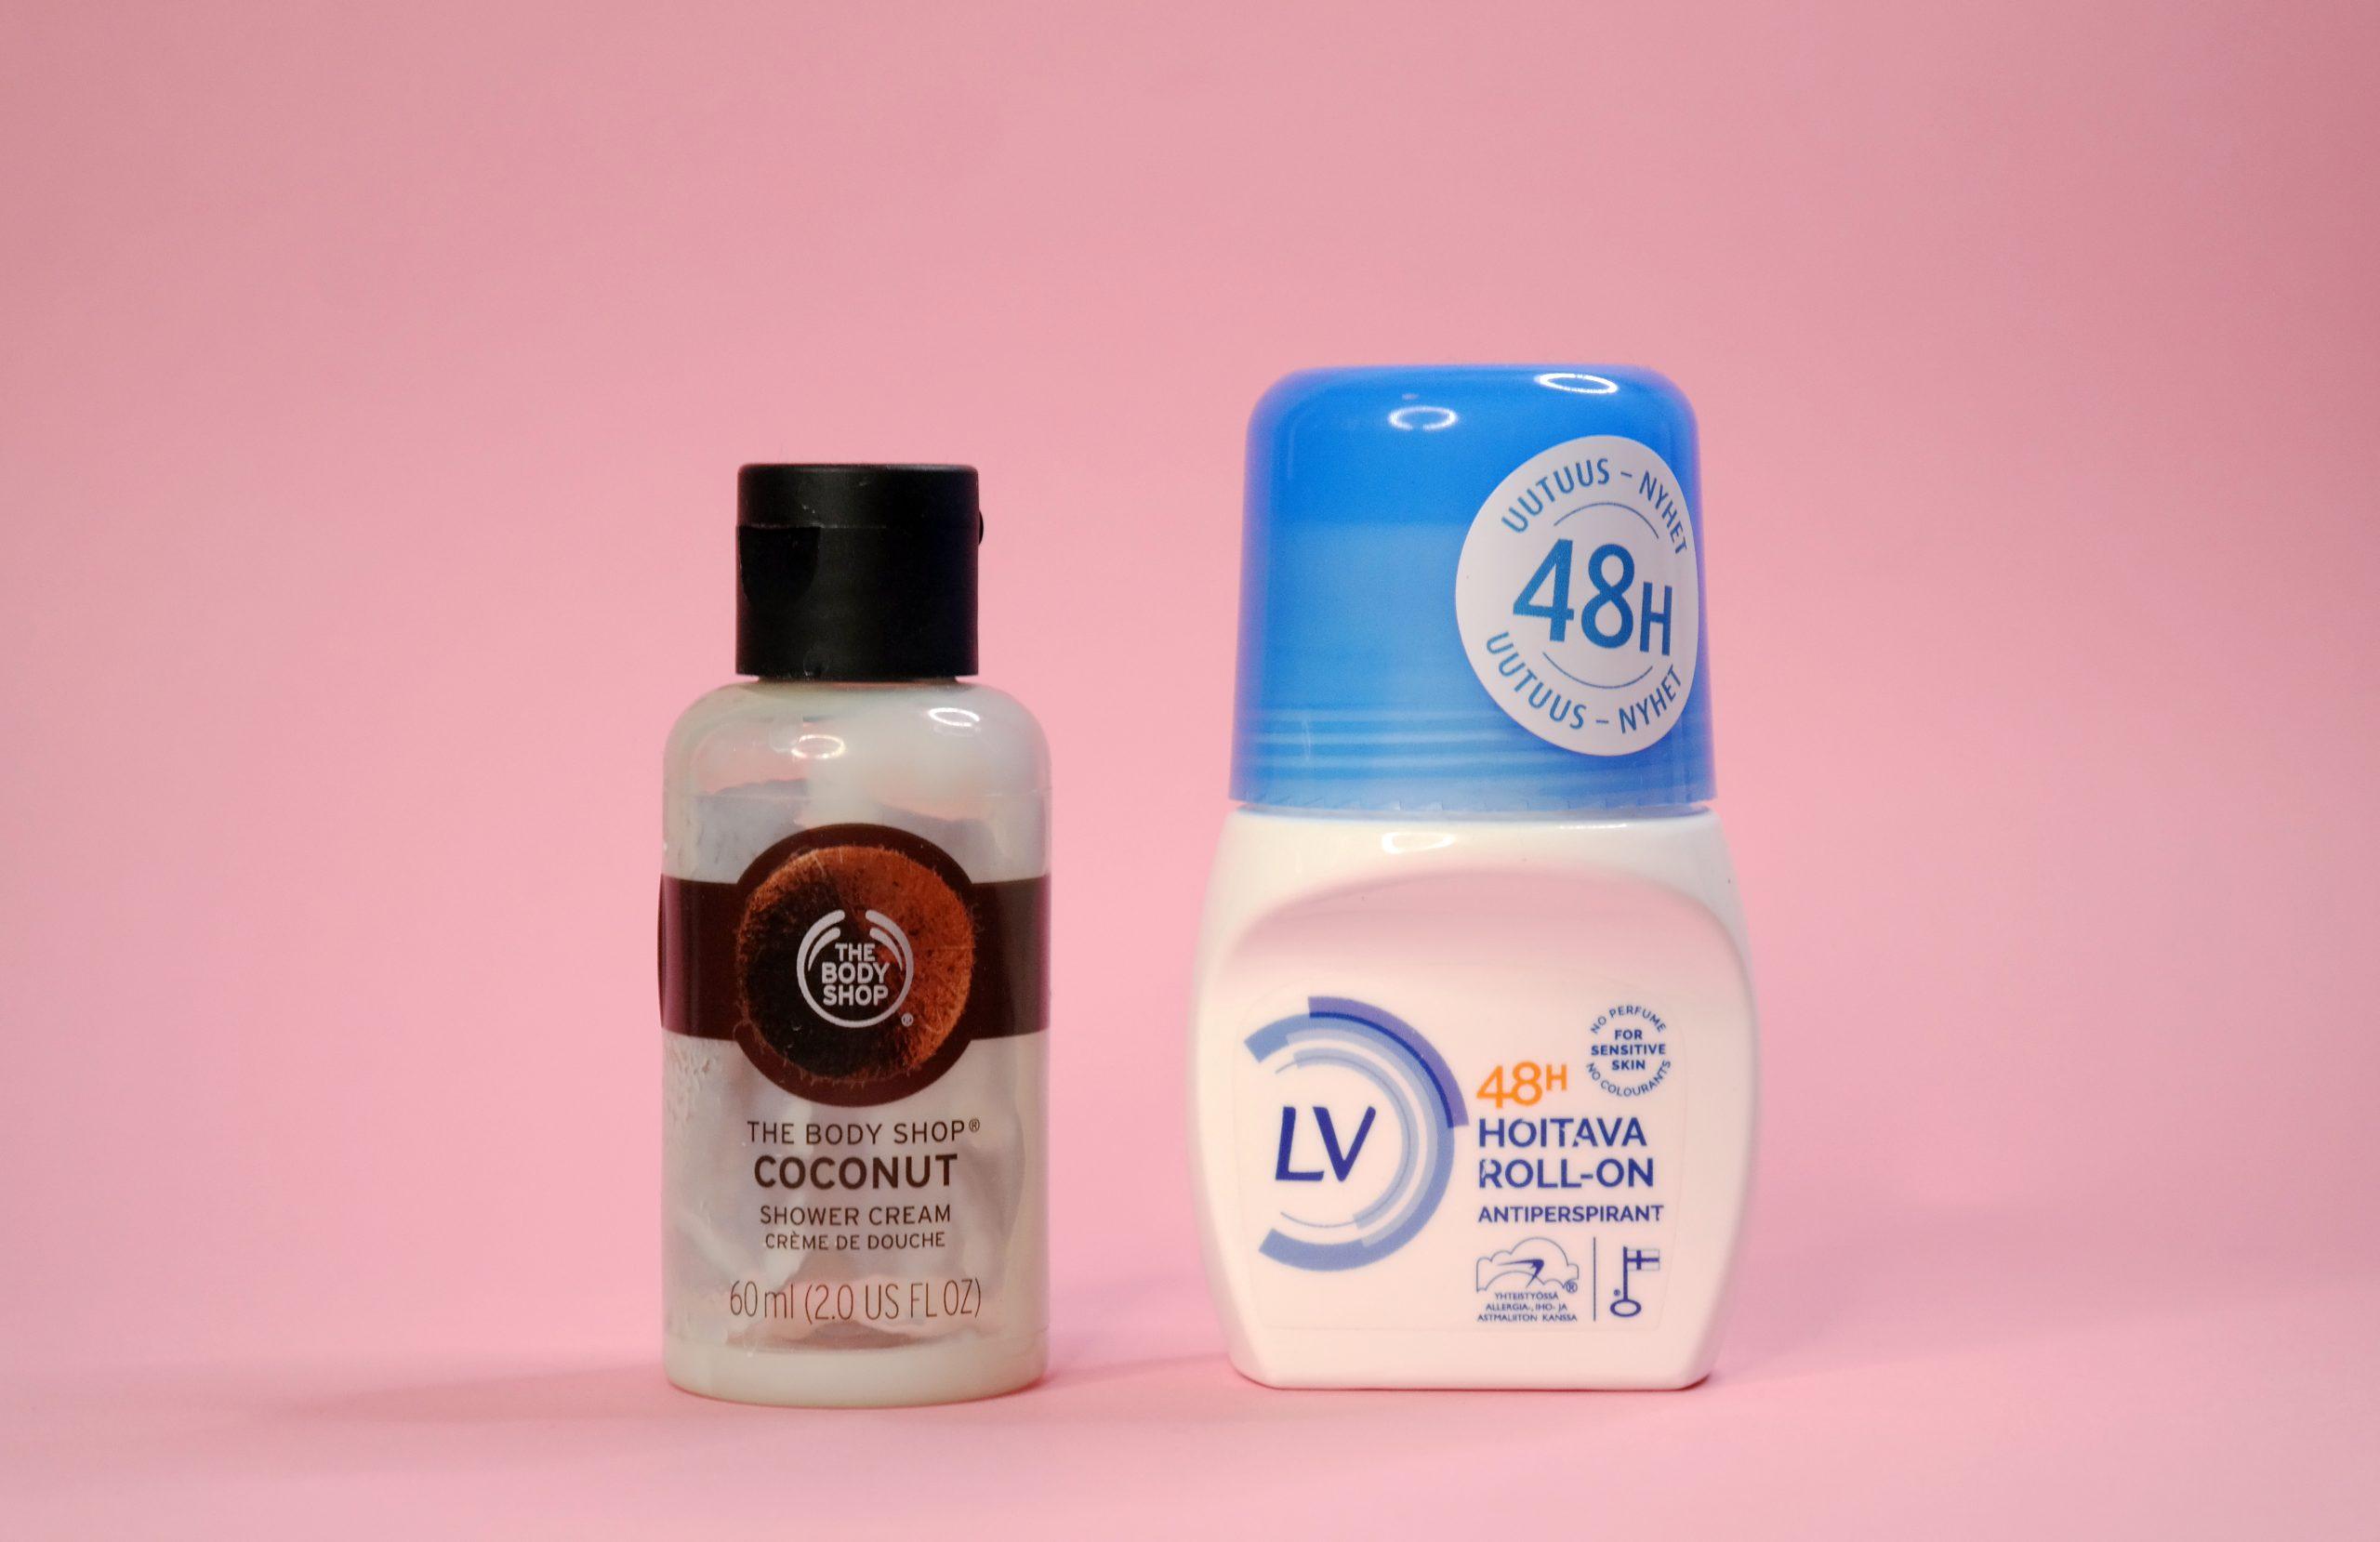 The Body Shop Coconut shower cream, LV Hoitava Roll-on antiperspirantti